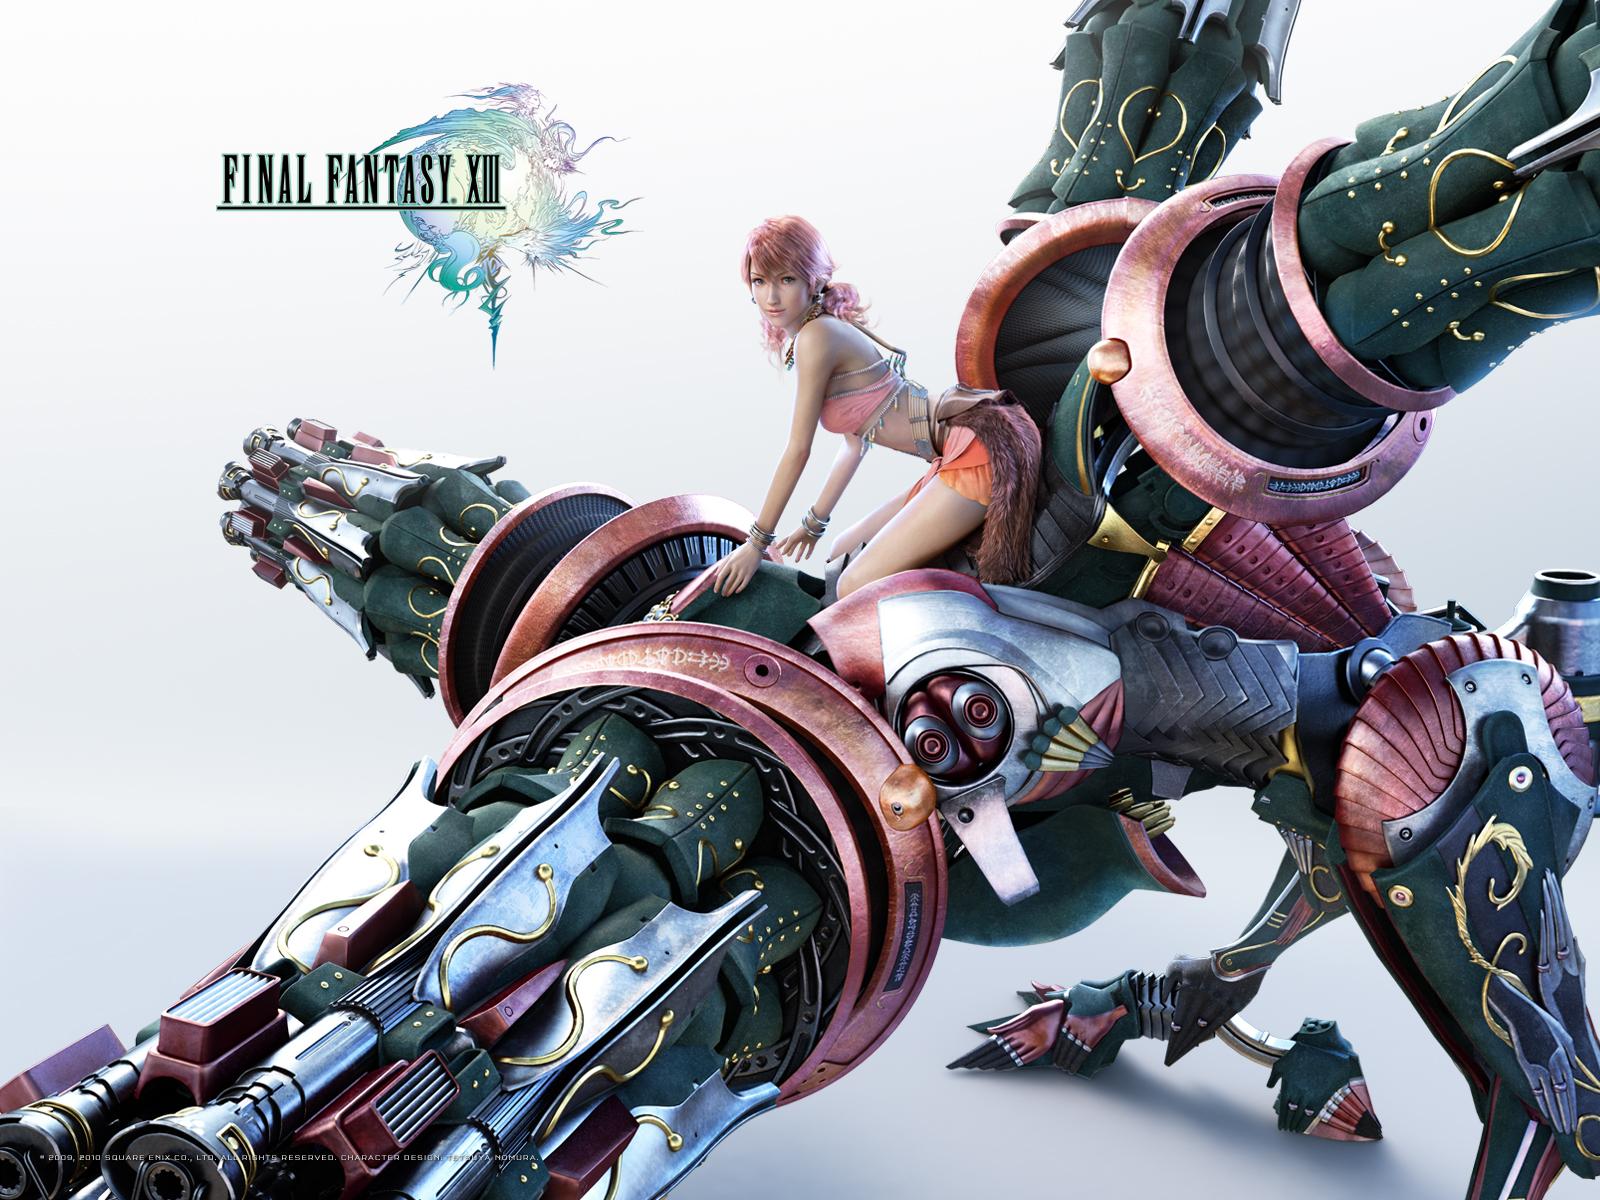 Final Fantasy XIII / FFXIII / FF13 - Wallpapers